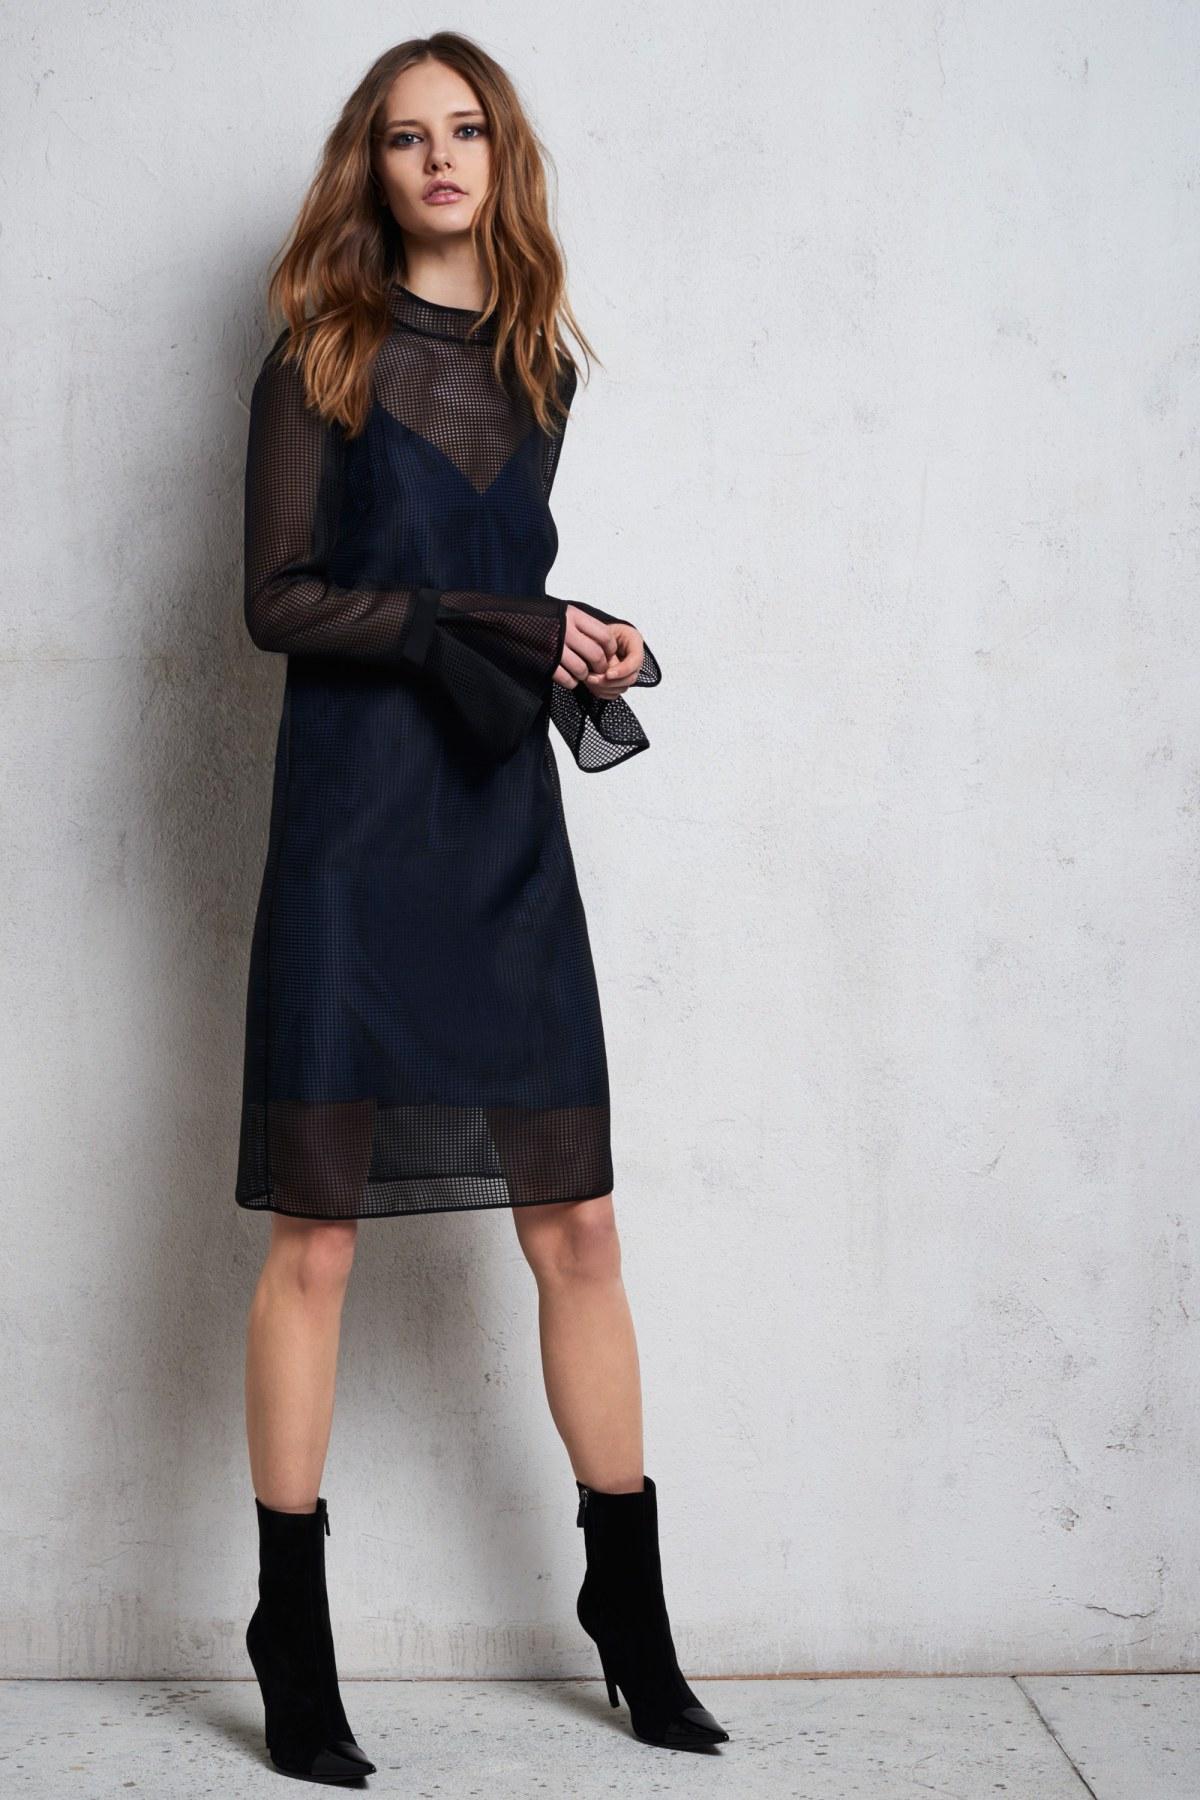 kimora-lee-simmons-pre-fall-2017-fashion-show-the-impression-11